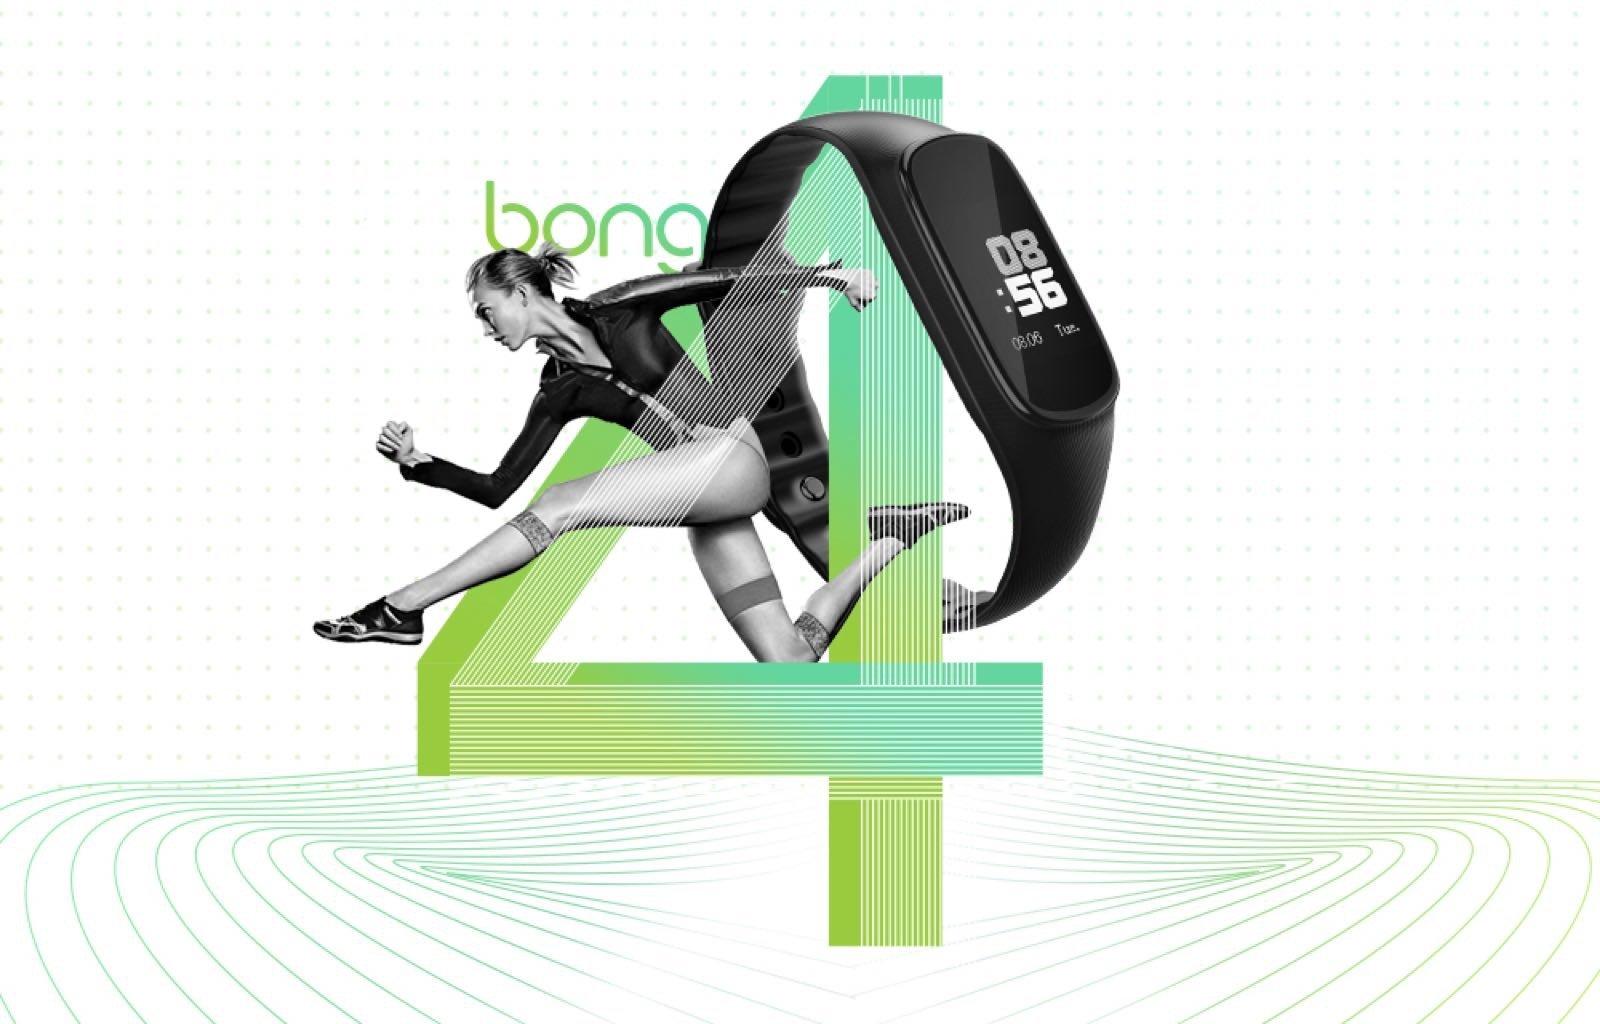 bong 4智能运动手环